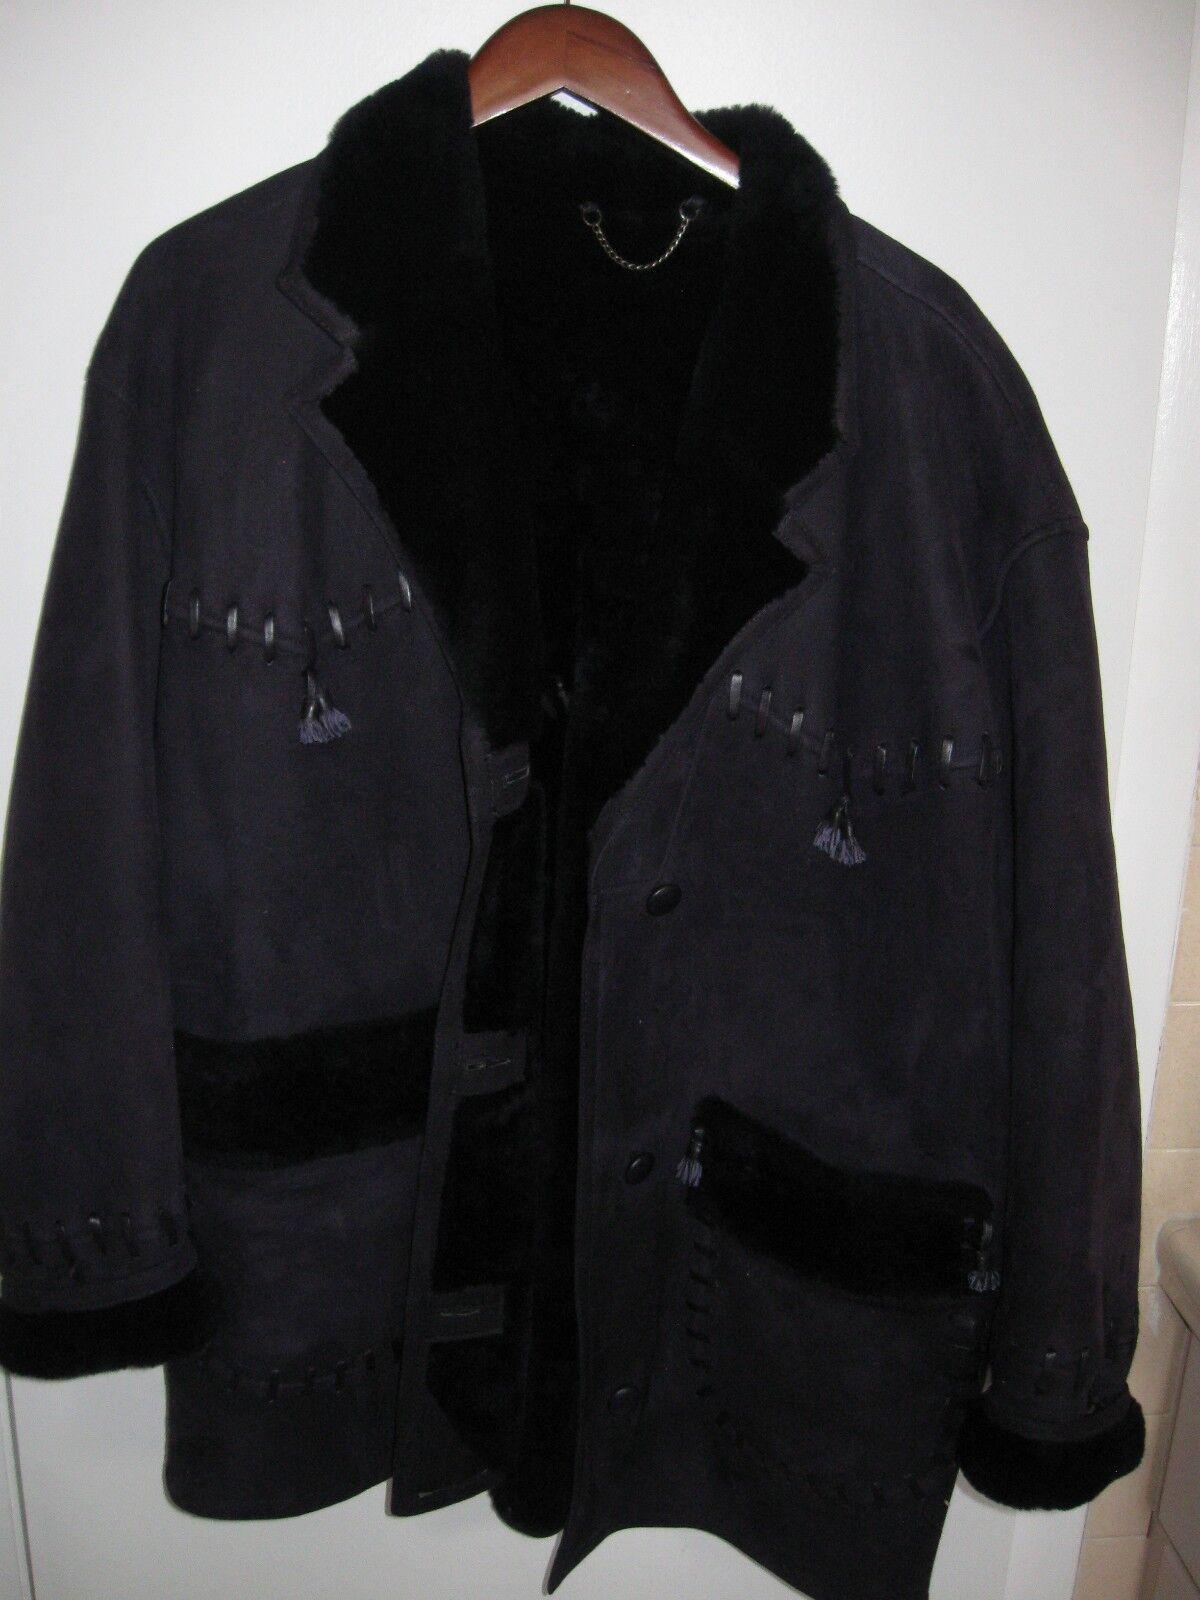 Premium Original Sheerling Leather Coat size IT 40 Made in Uruguay